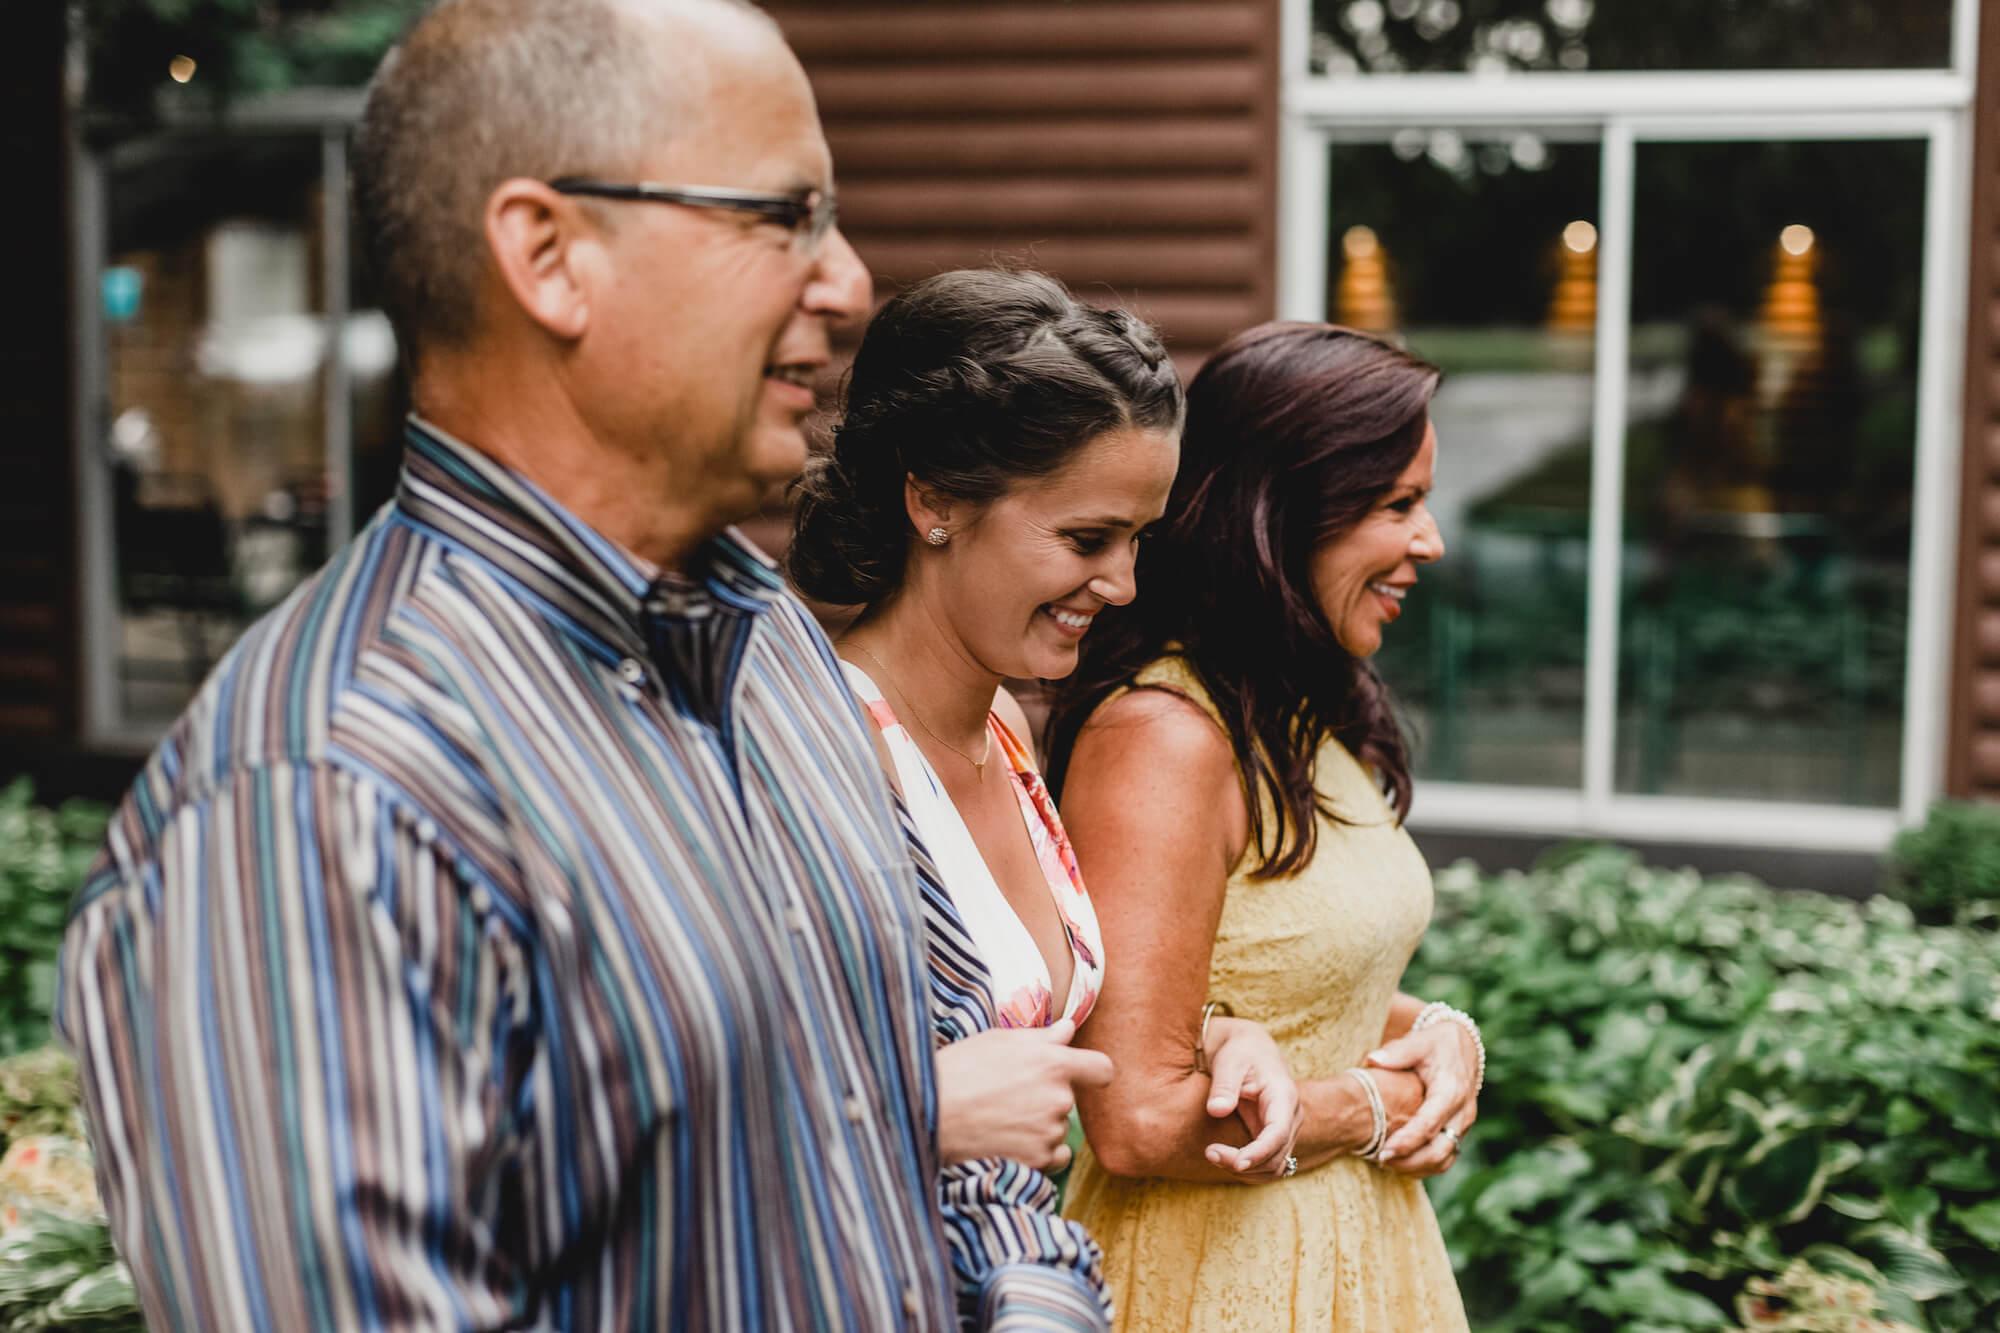 engle-olson-maddy-pat-mn-wedding-photography-22.jpg